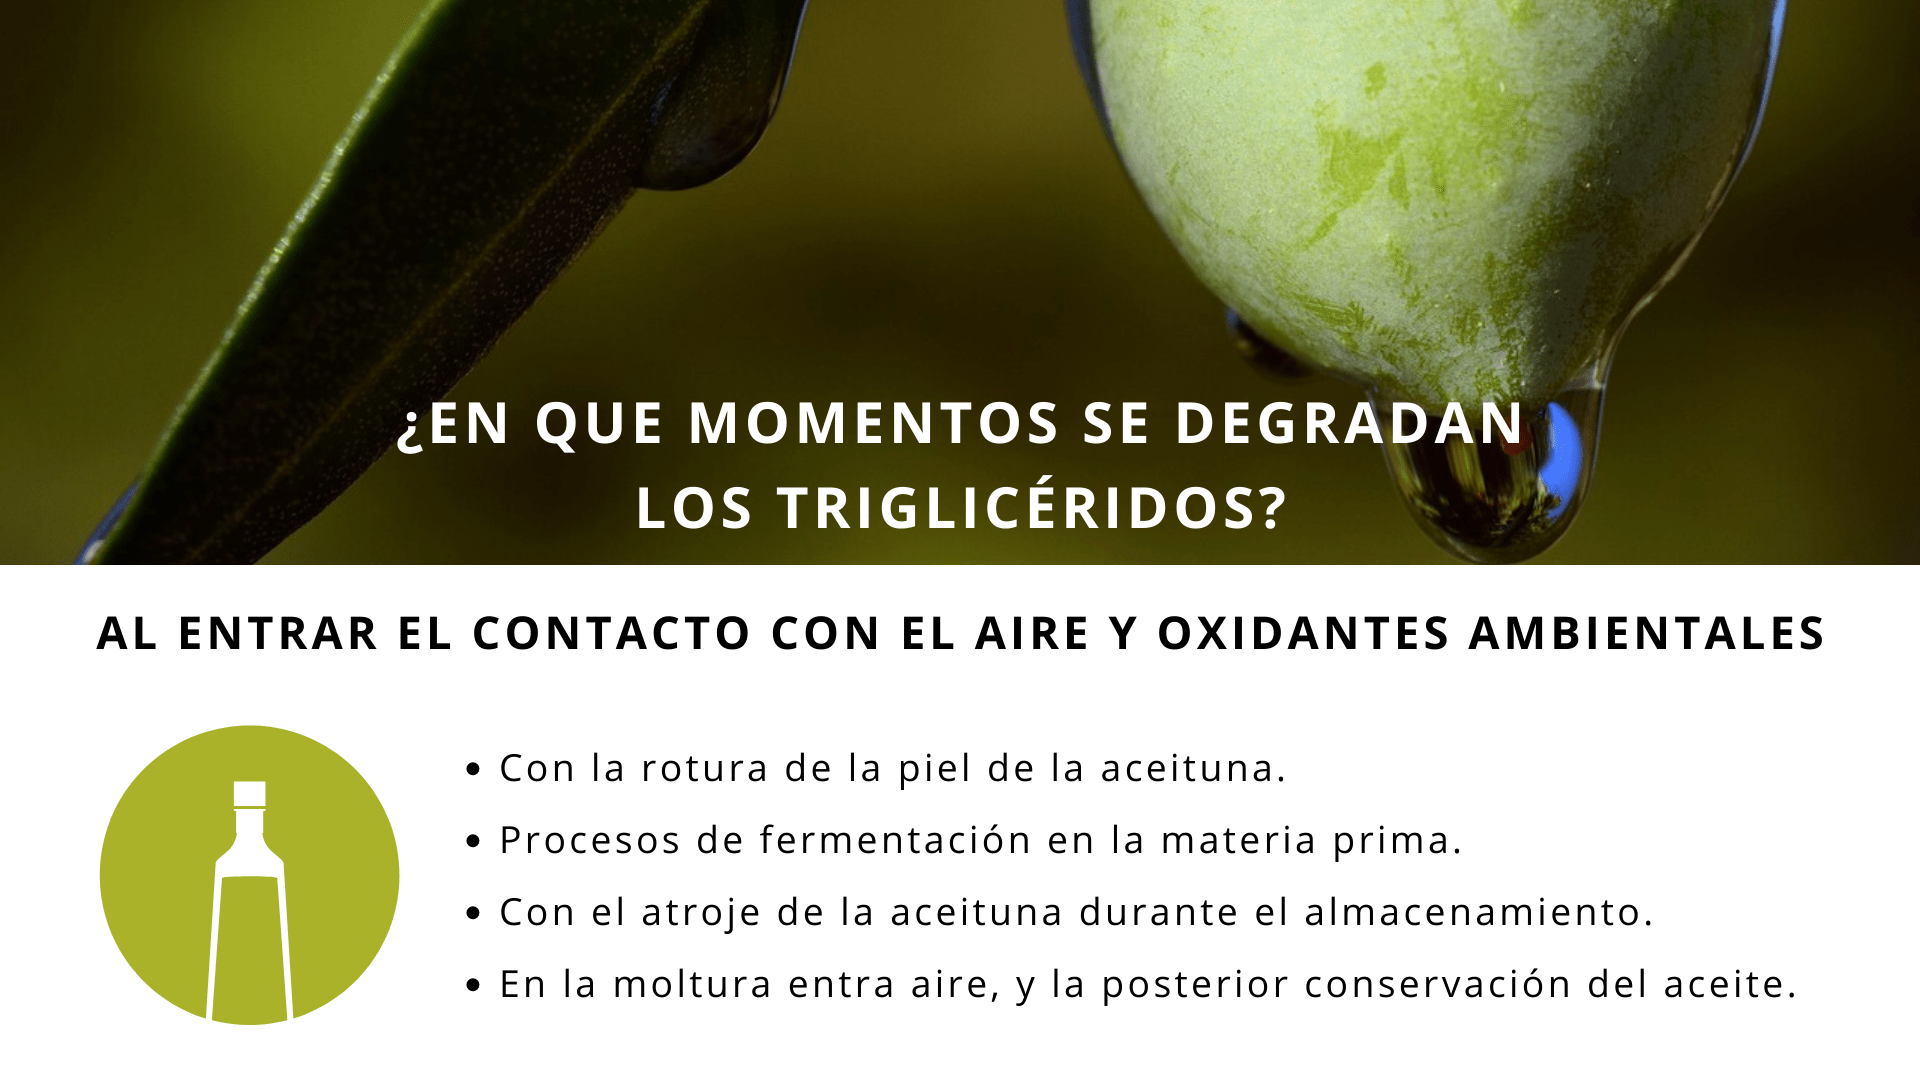 Parámetos analíticos aceites oliva 2